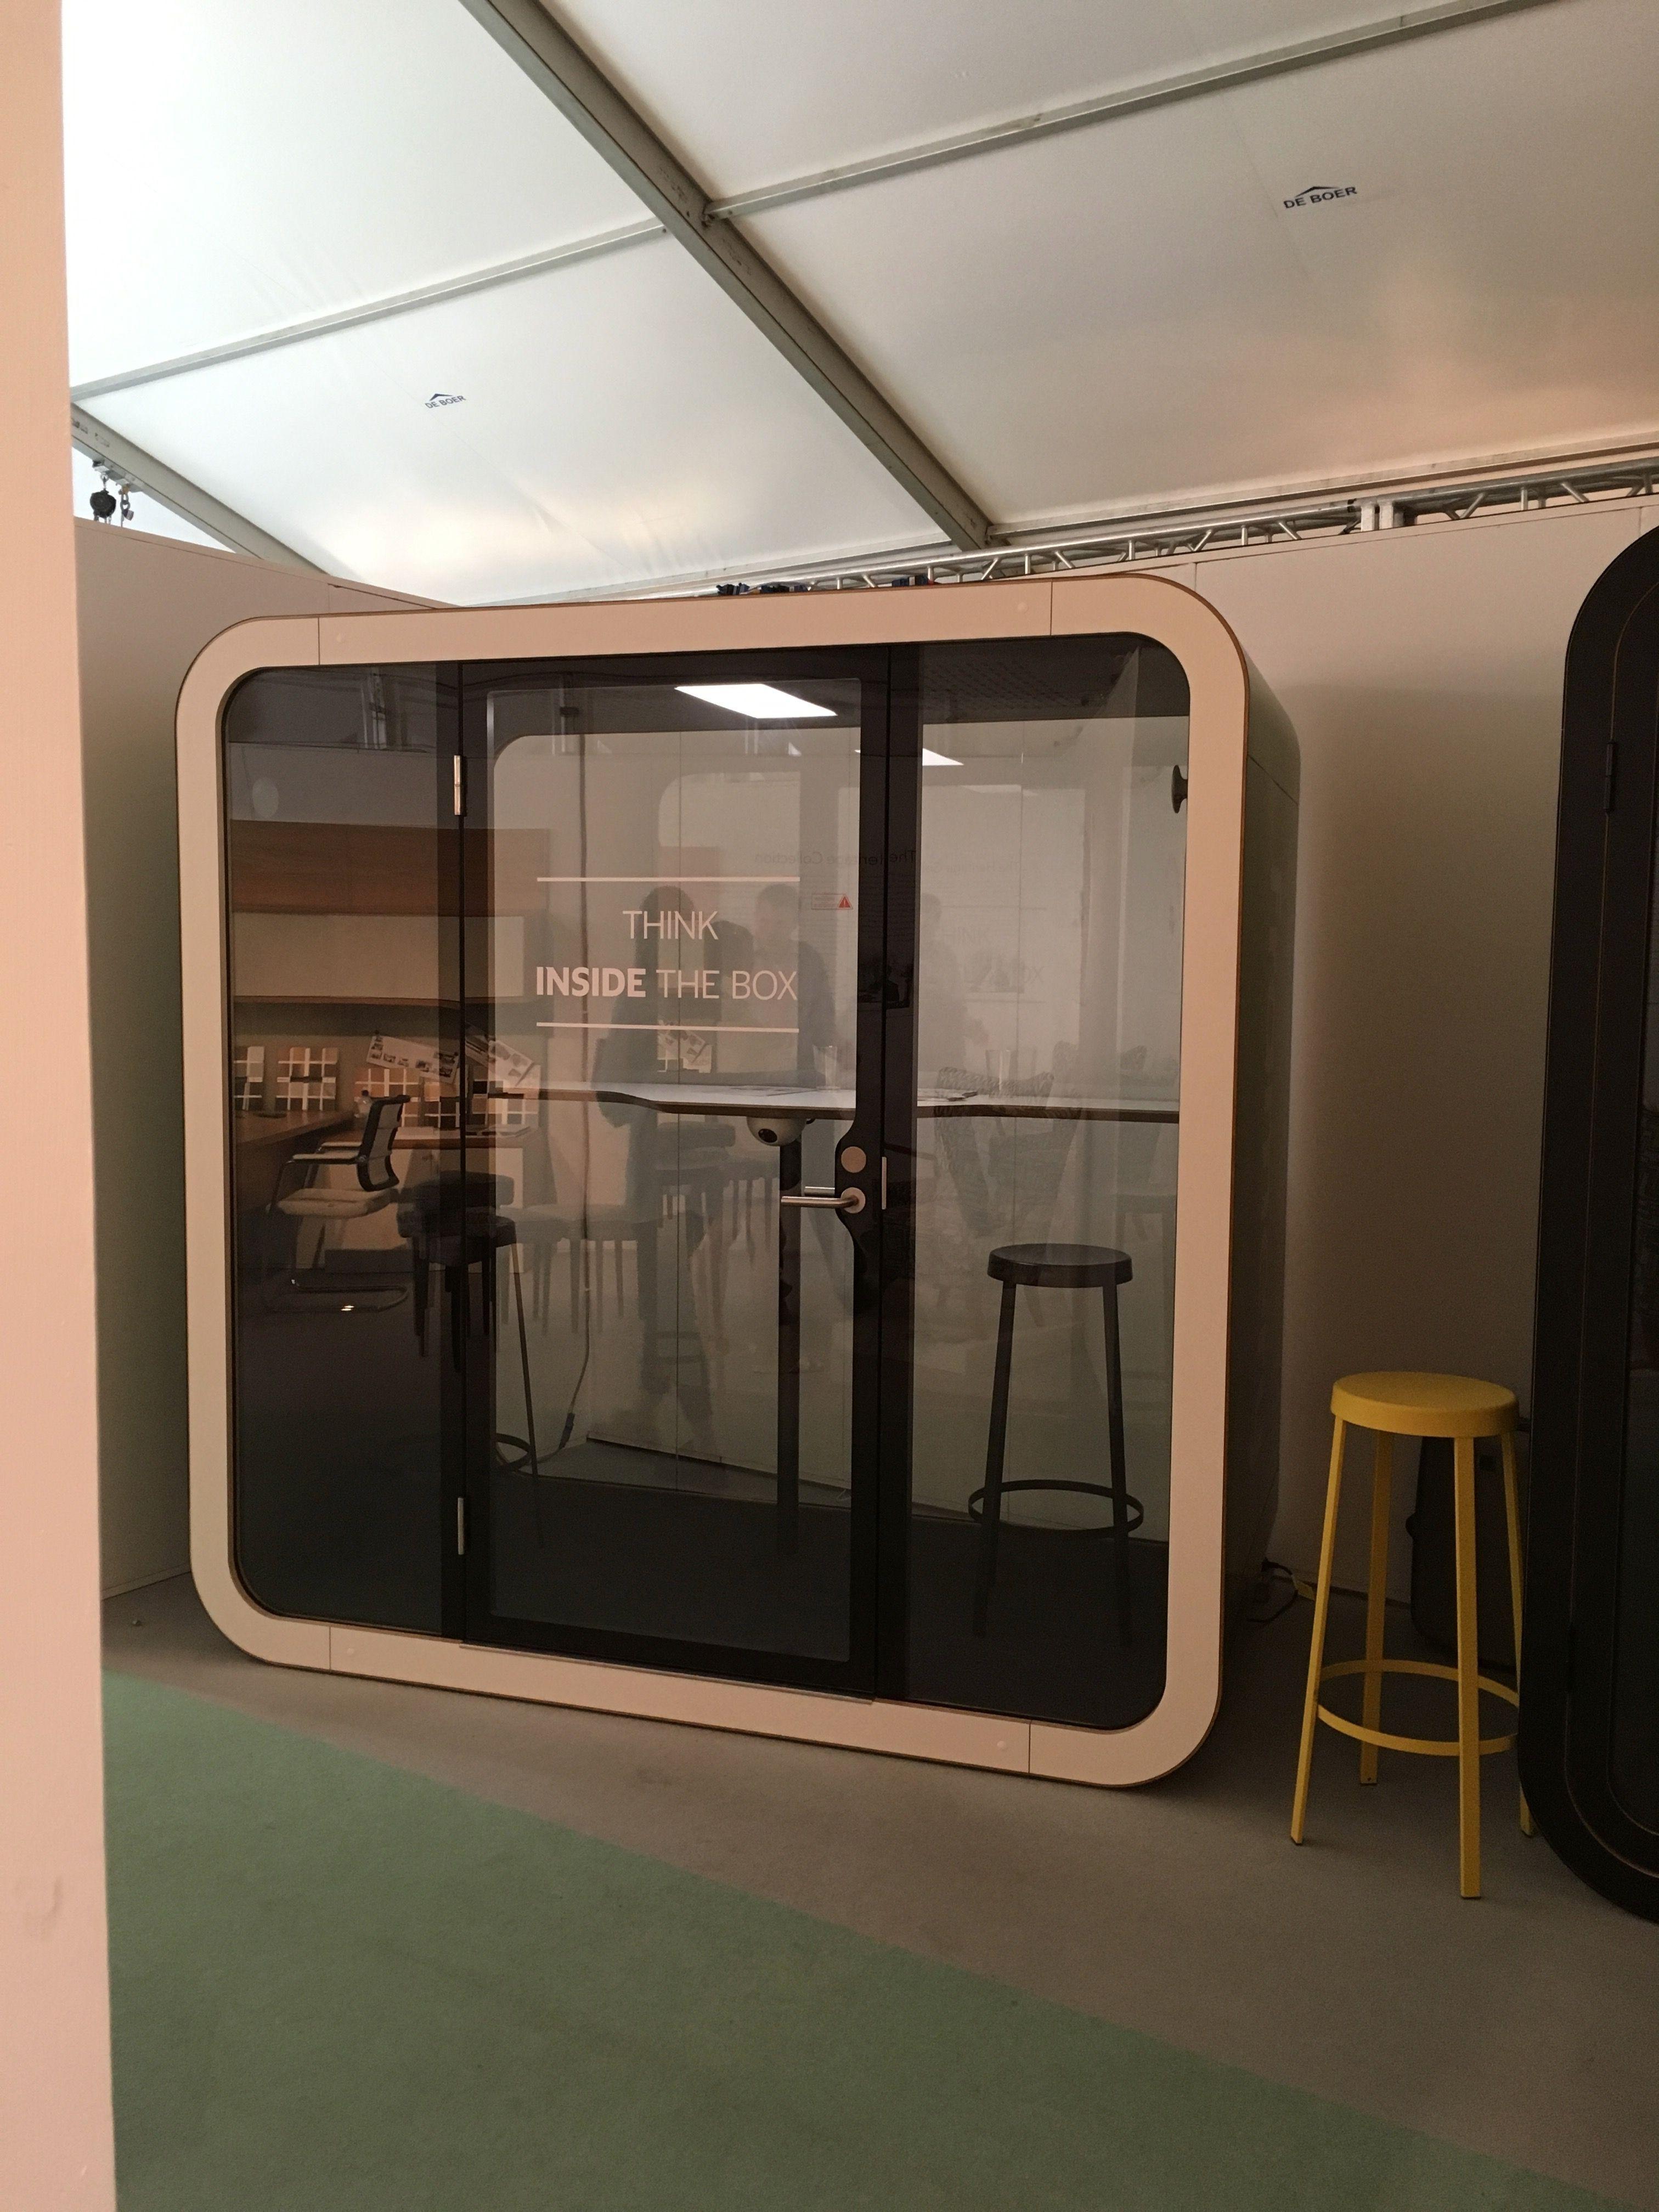 Framery Q Booth at Clerkenwell Design Week 2017 #CDW2017  #clerkenwelldesignweek #design #designinspiration